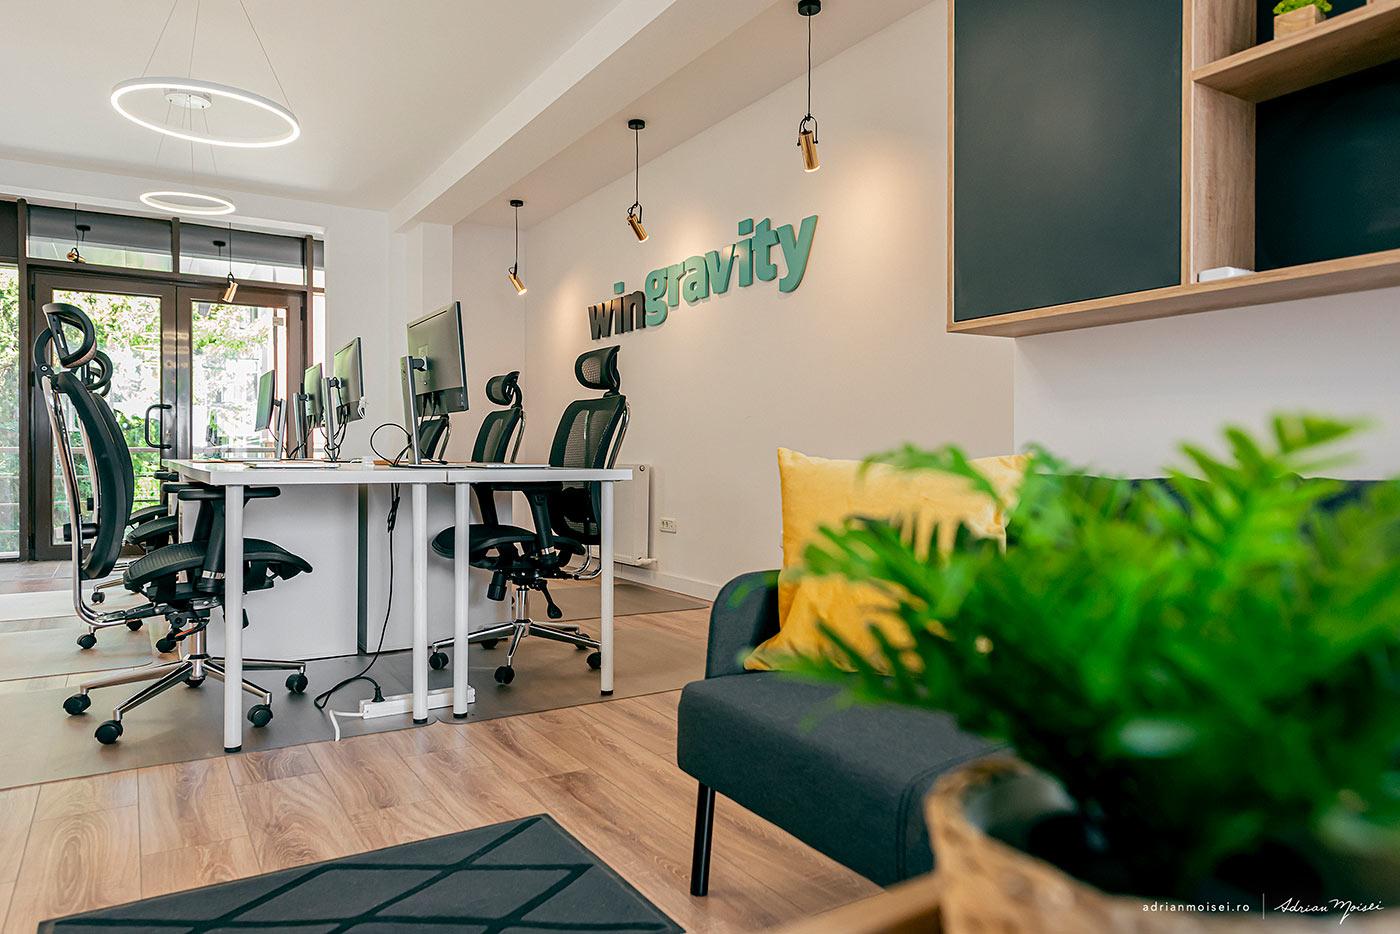 WinGravity Office - the company behind Slashcore